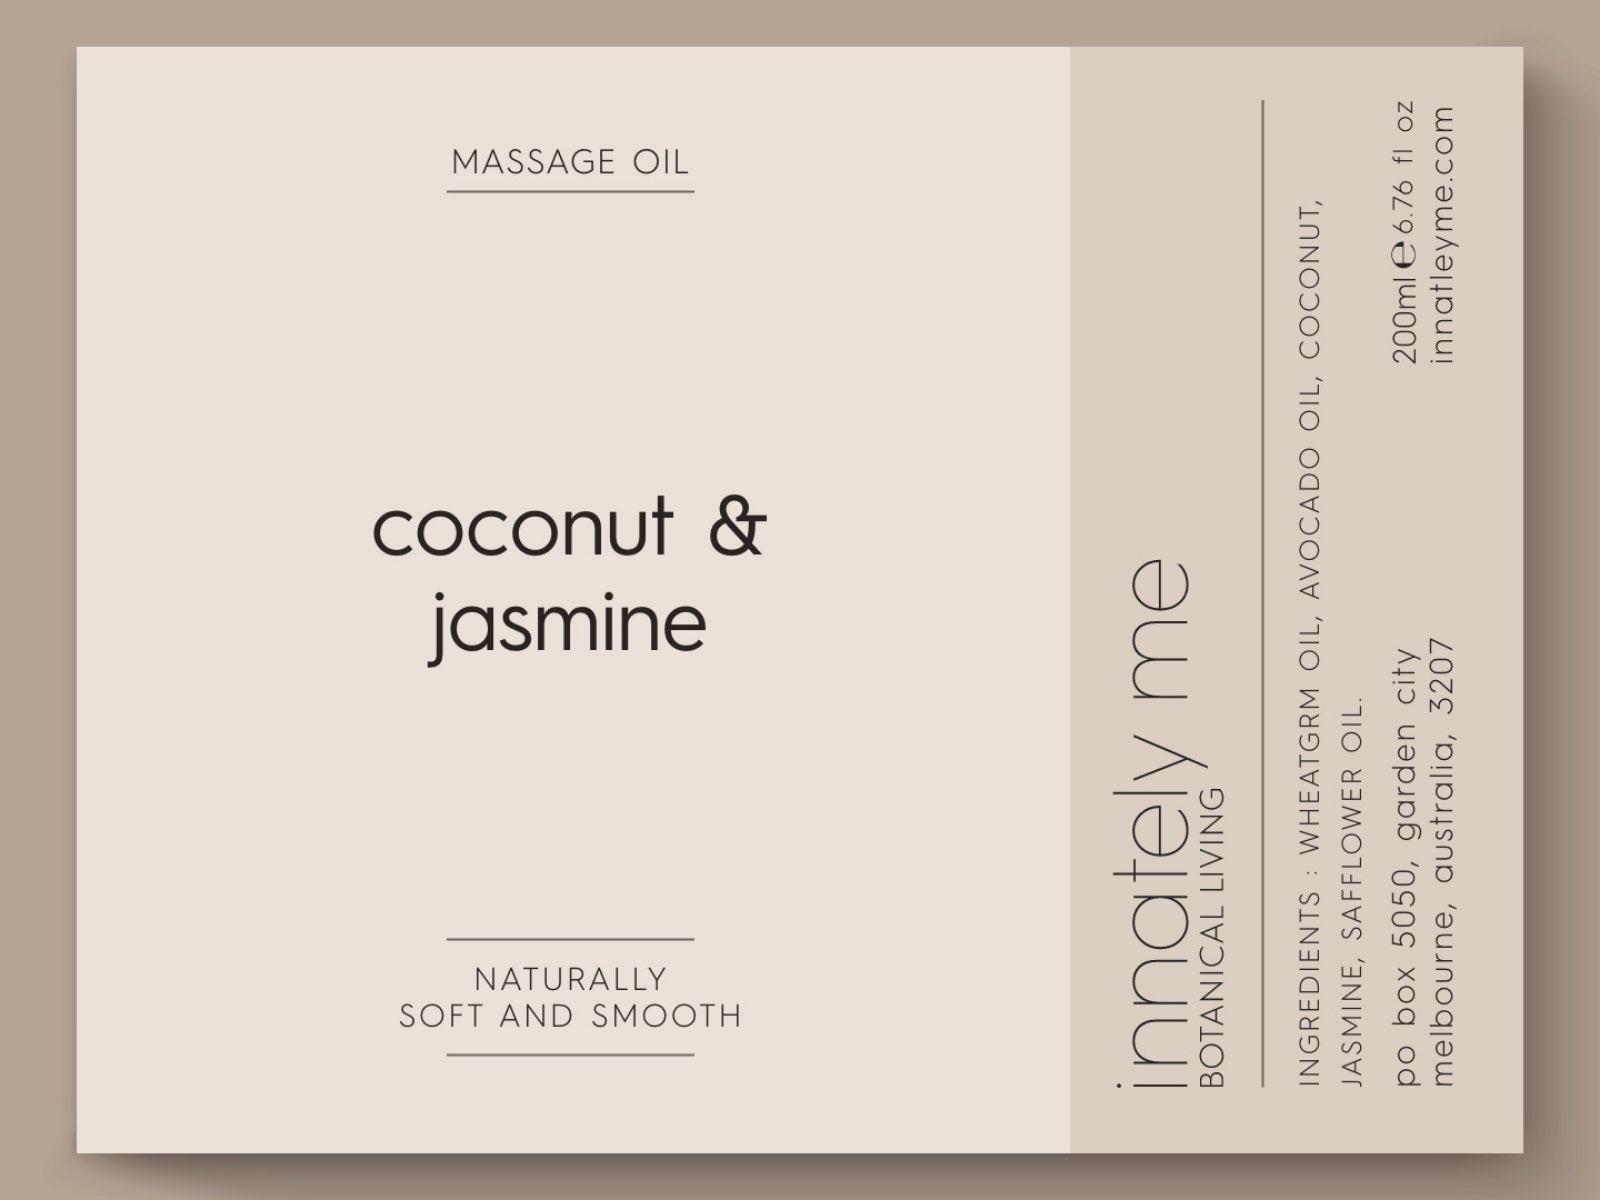 Coconut jasmine label design